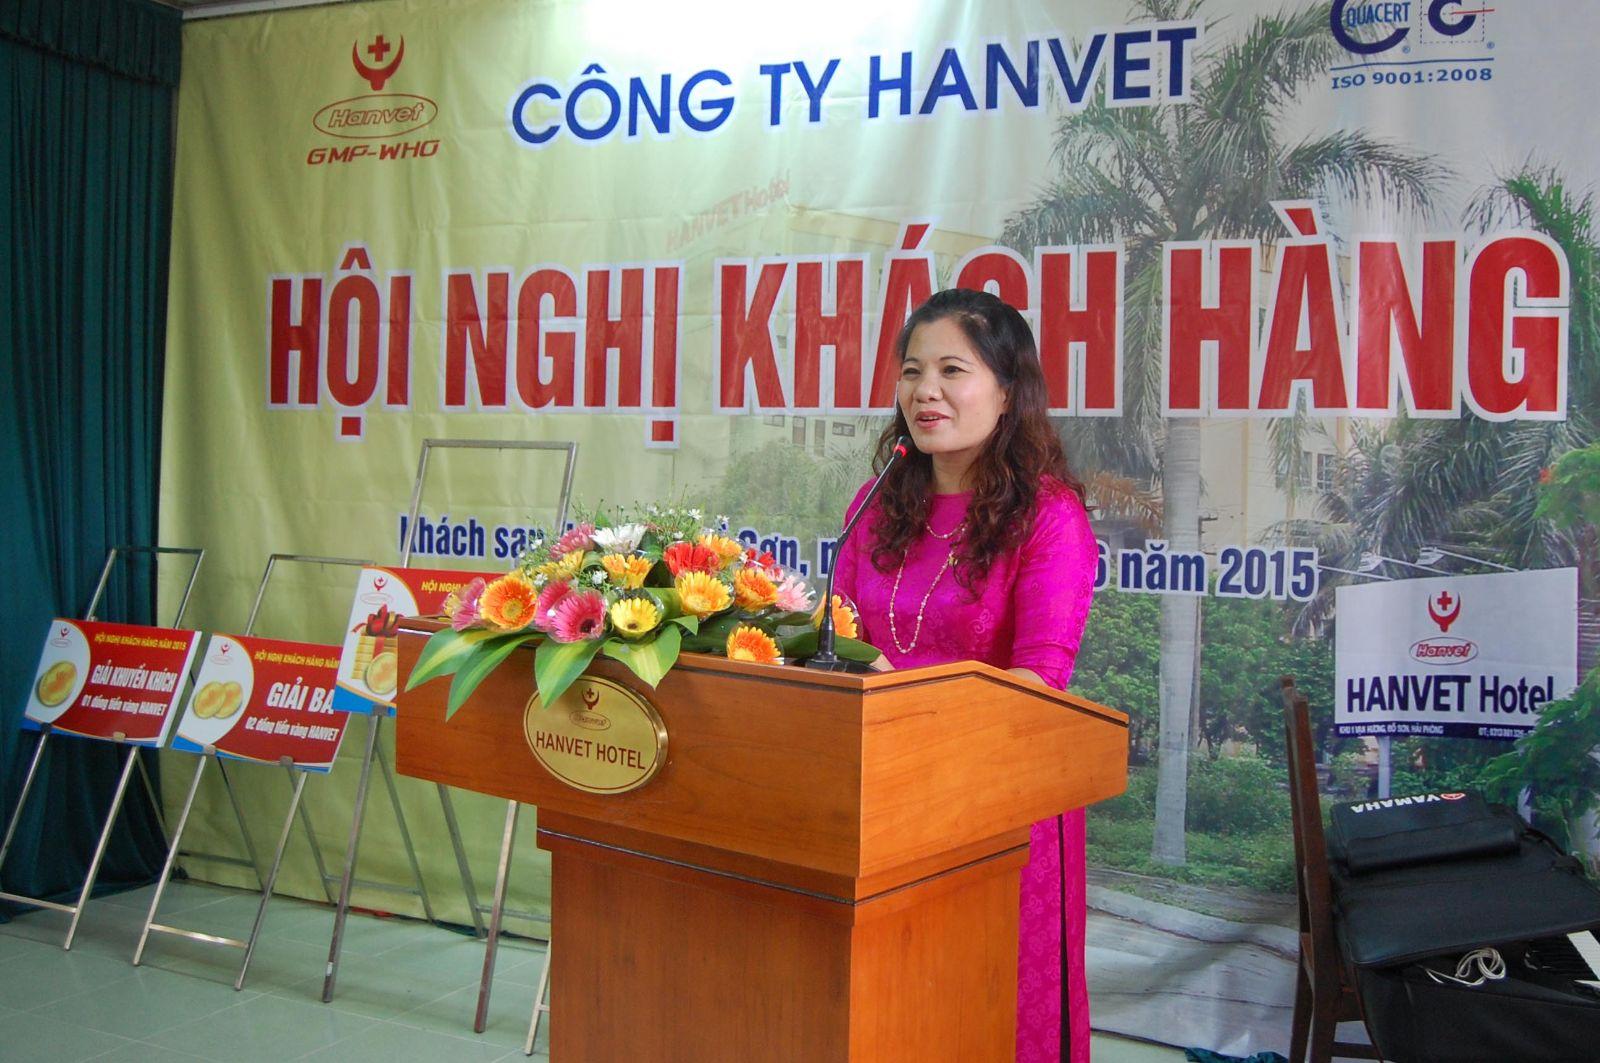 hanvet.com.vn